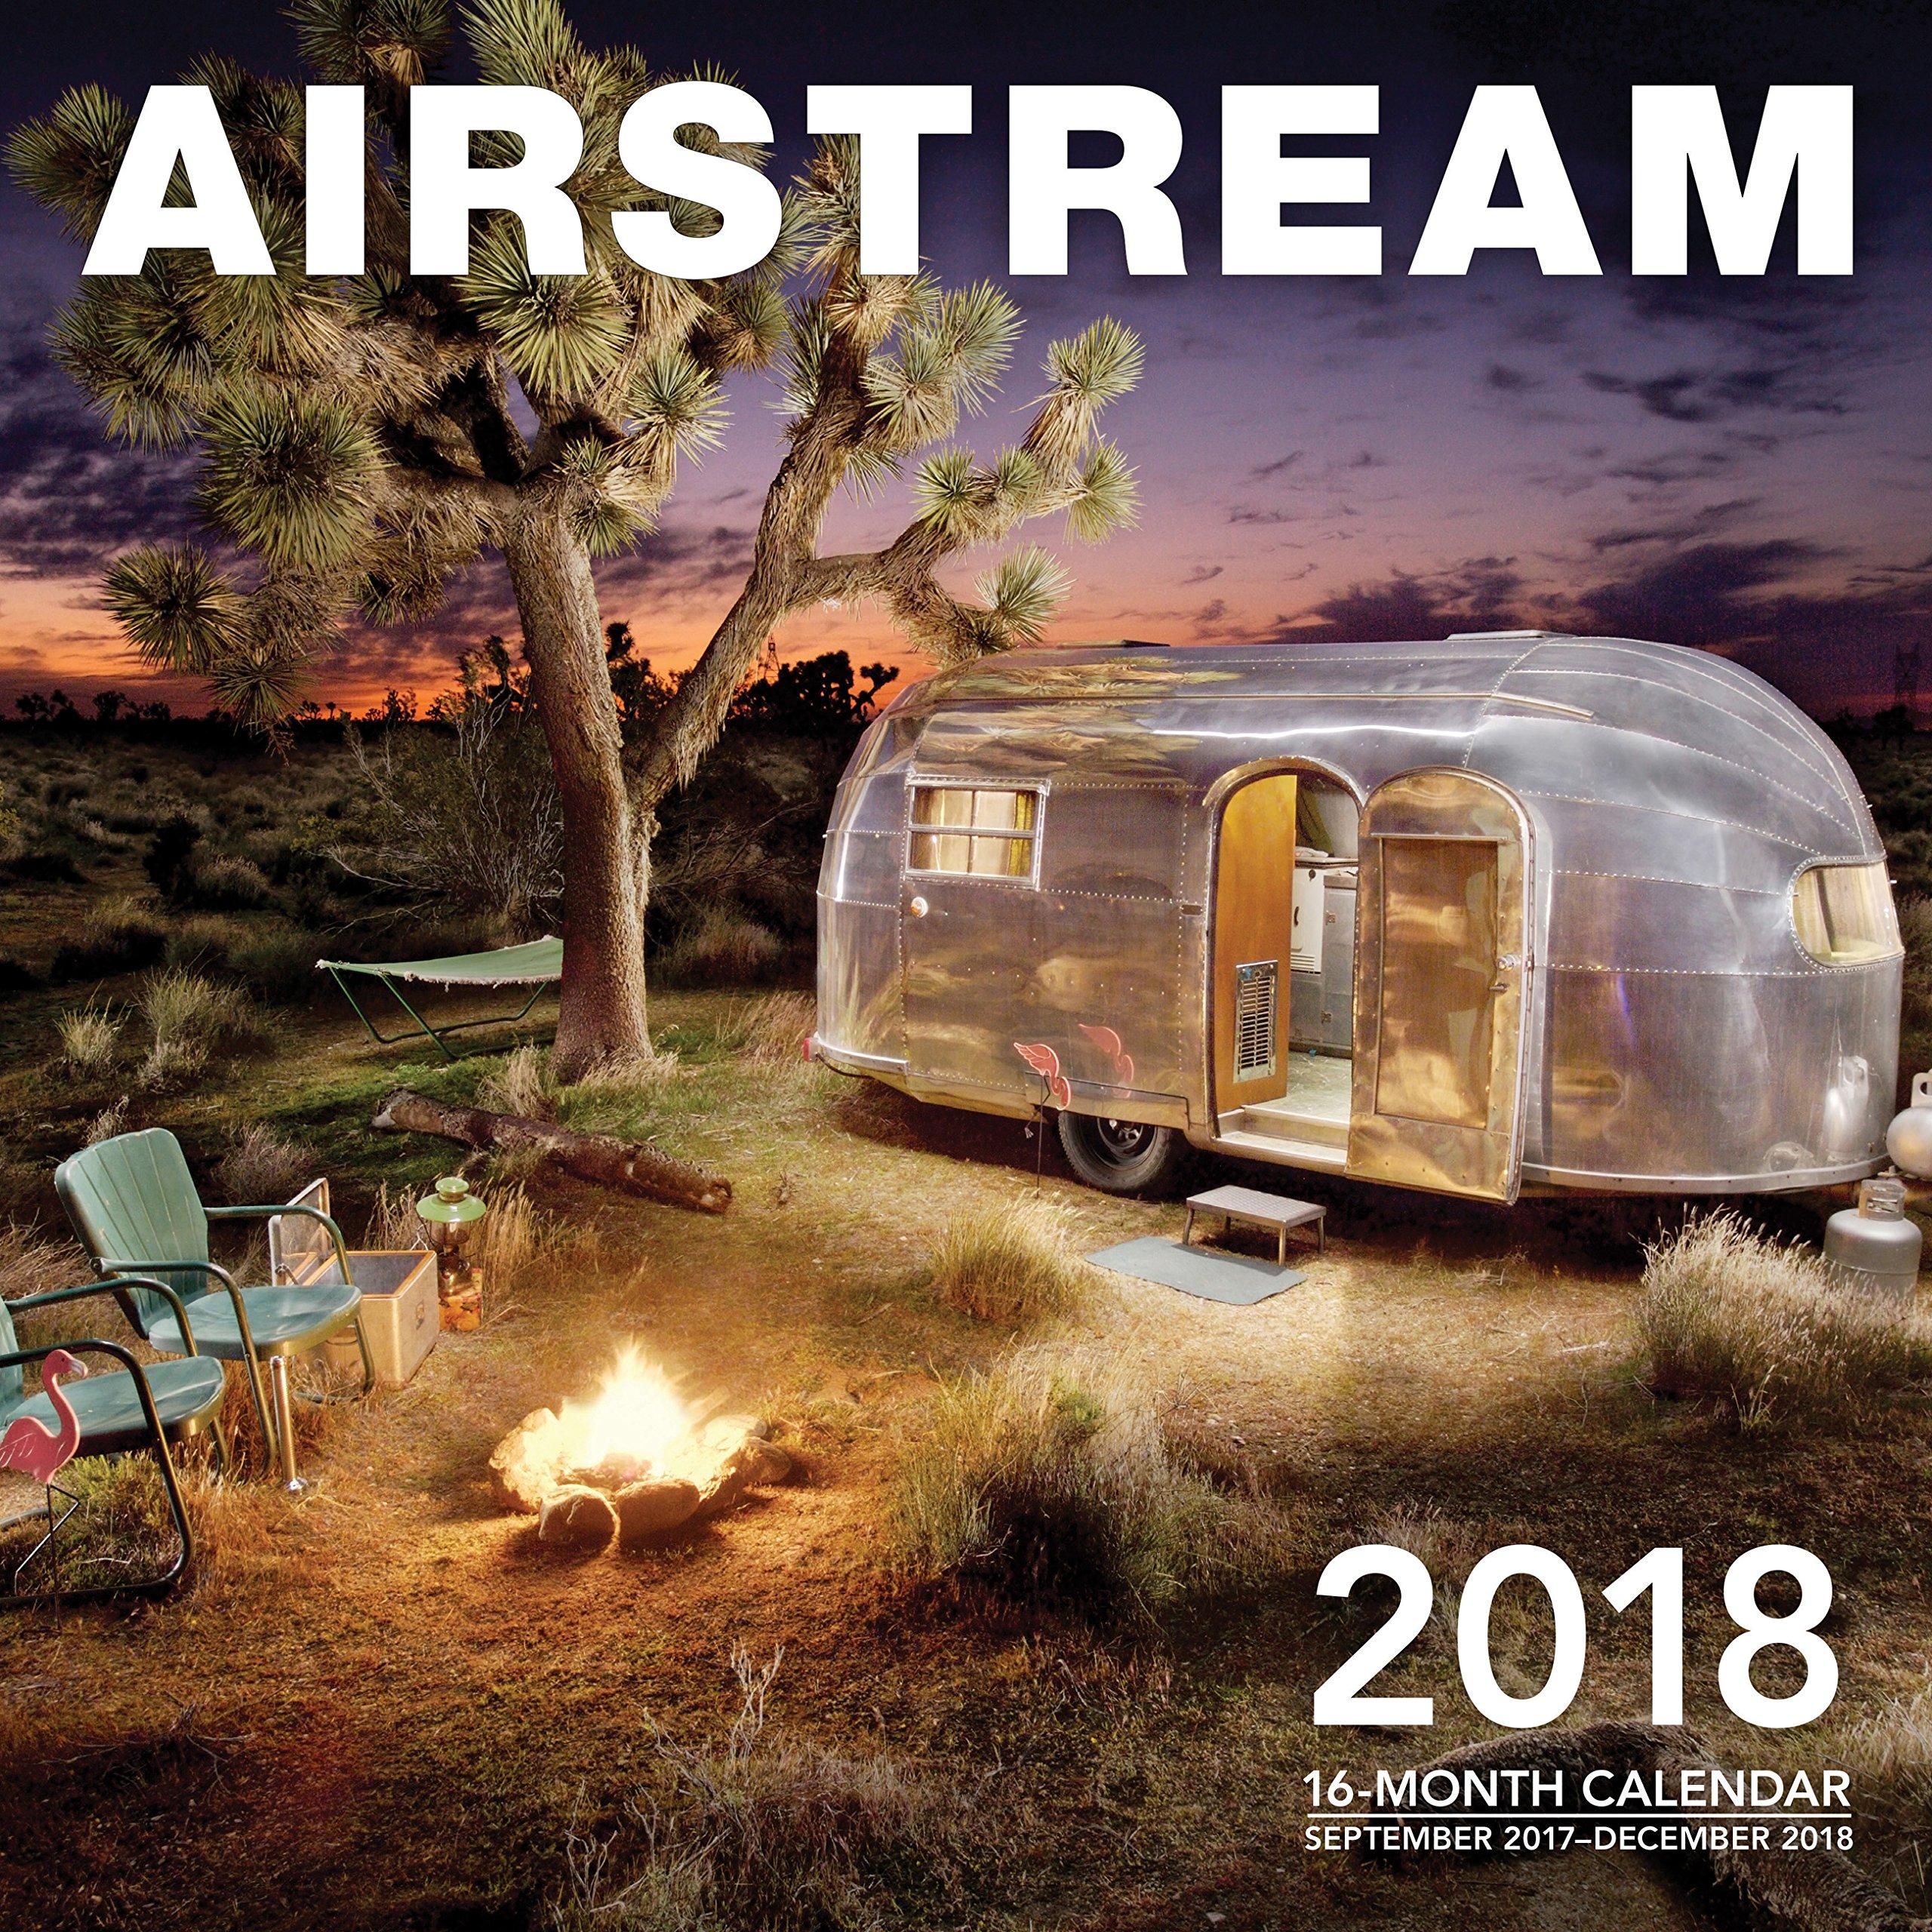 Airstream 2018: 16 Month Calendar Includes September 2017